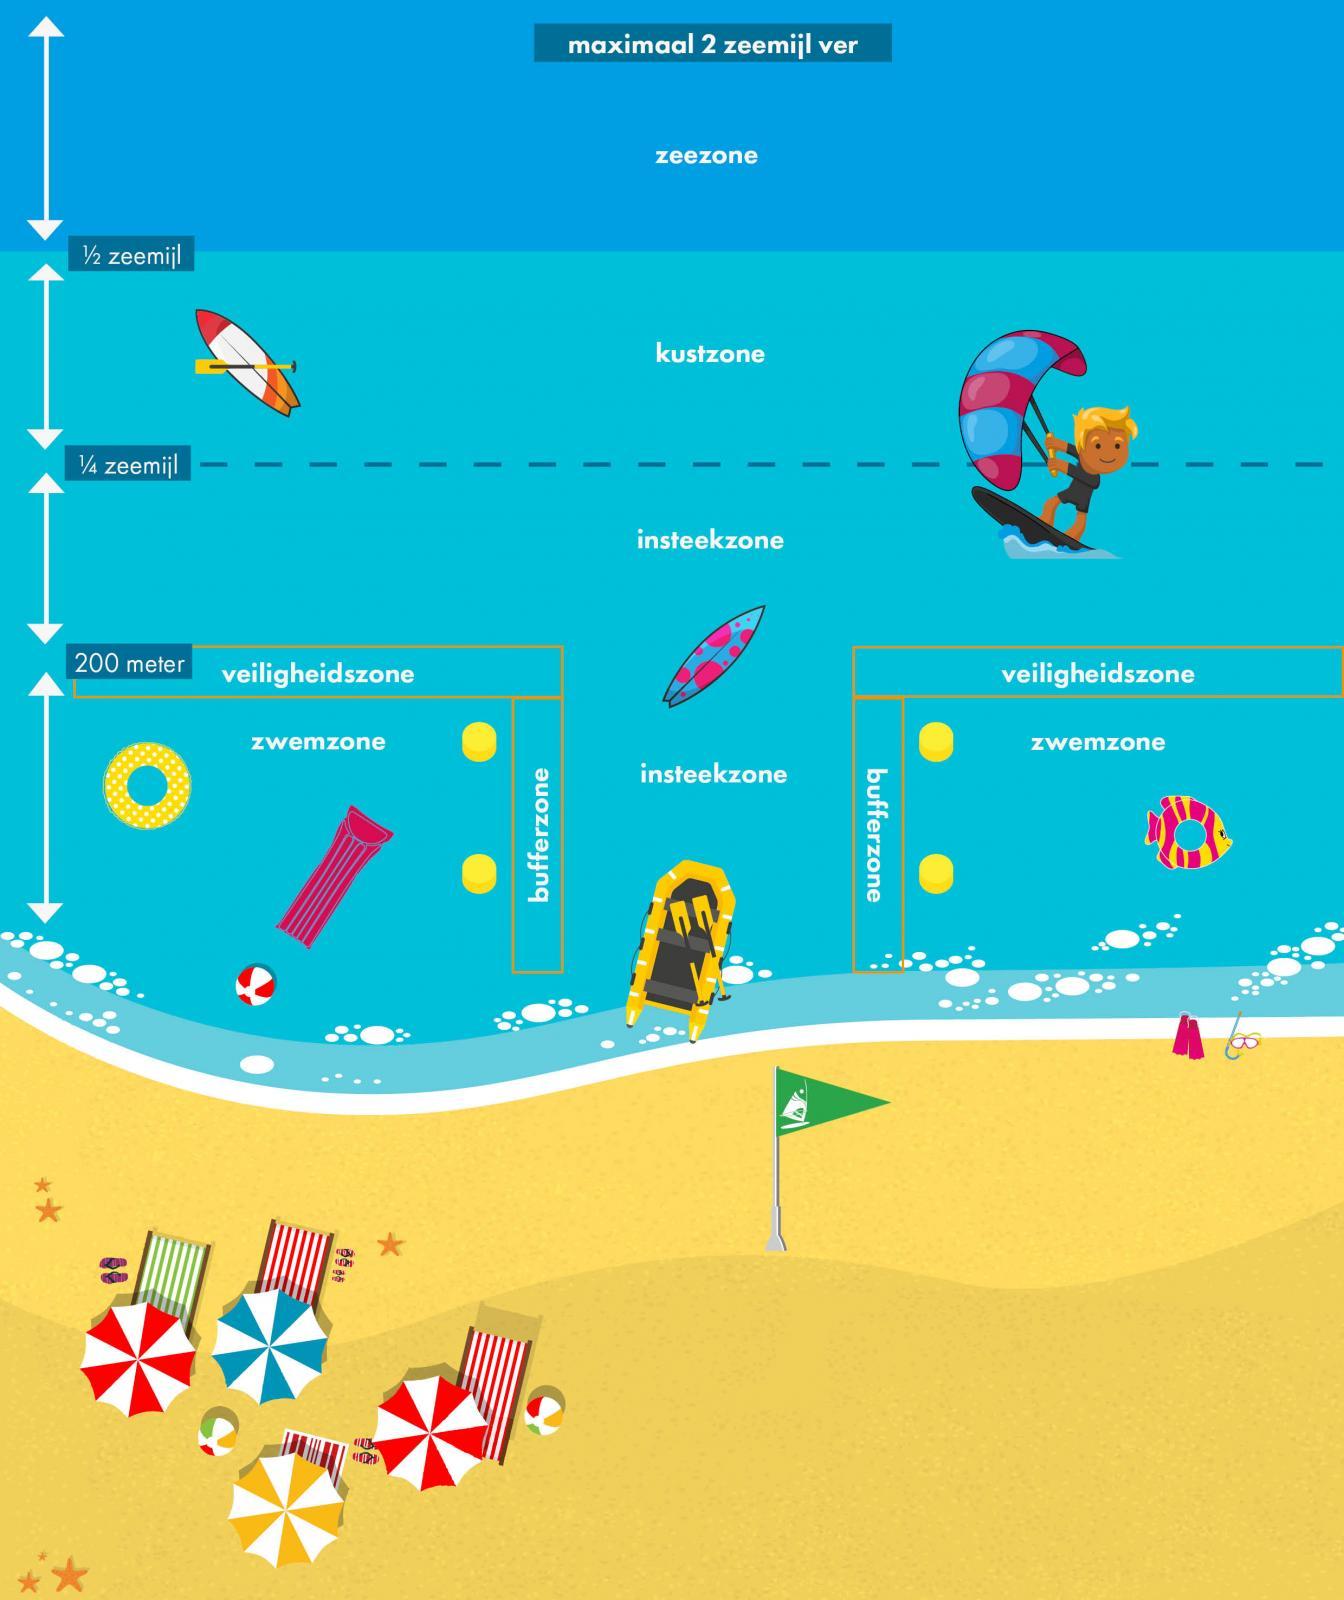 Kitespots Belgie Zone uitleg